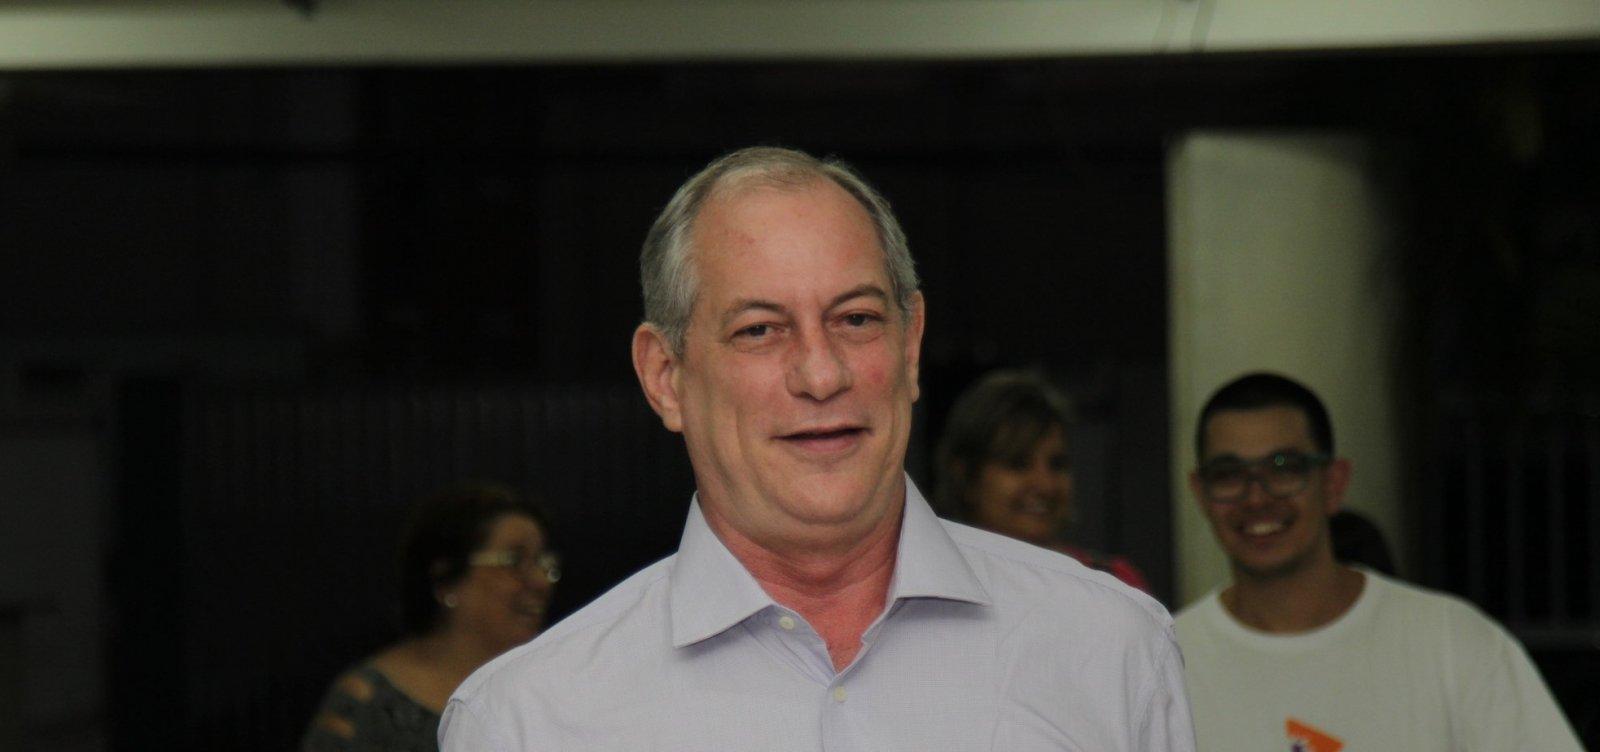 Ciro desafia Bolsonaro a ir a debate e diz que 'atestado médico falso é crime'